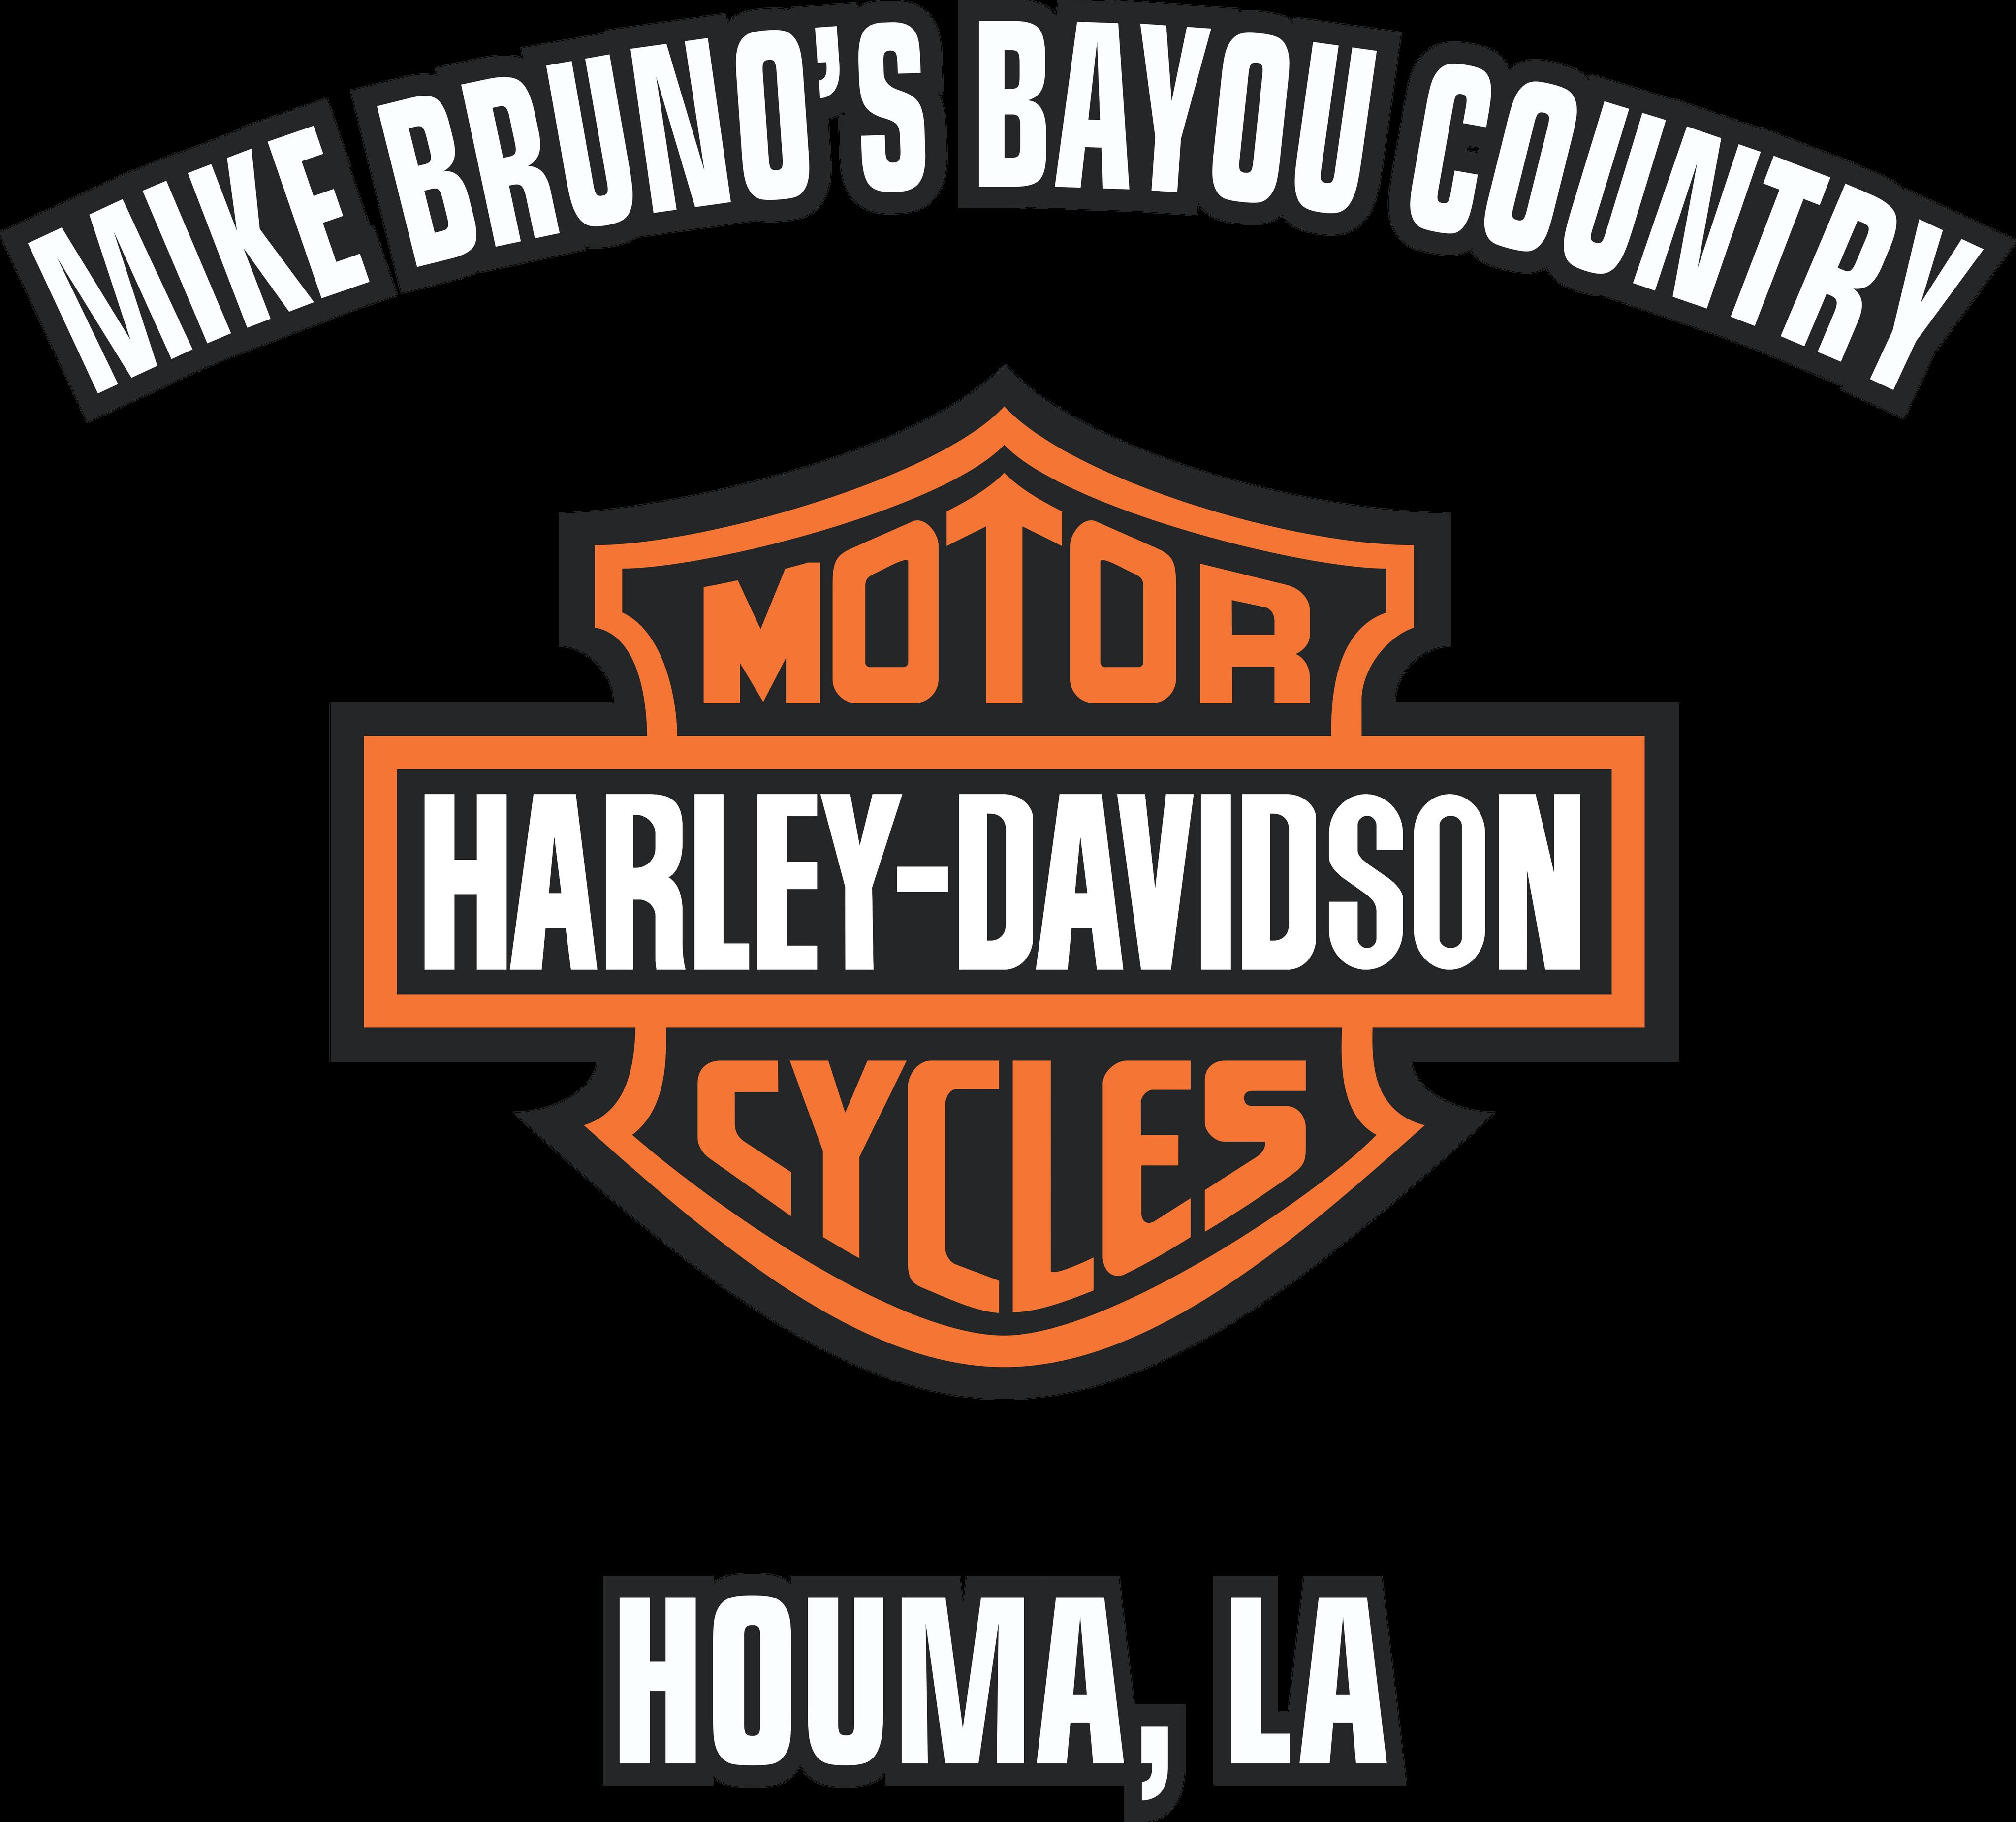 Mike Bruno's Bayou County Harley-Davidson